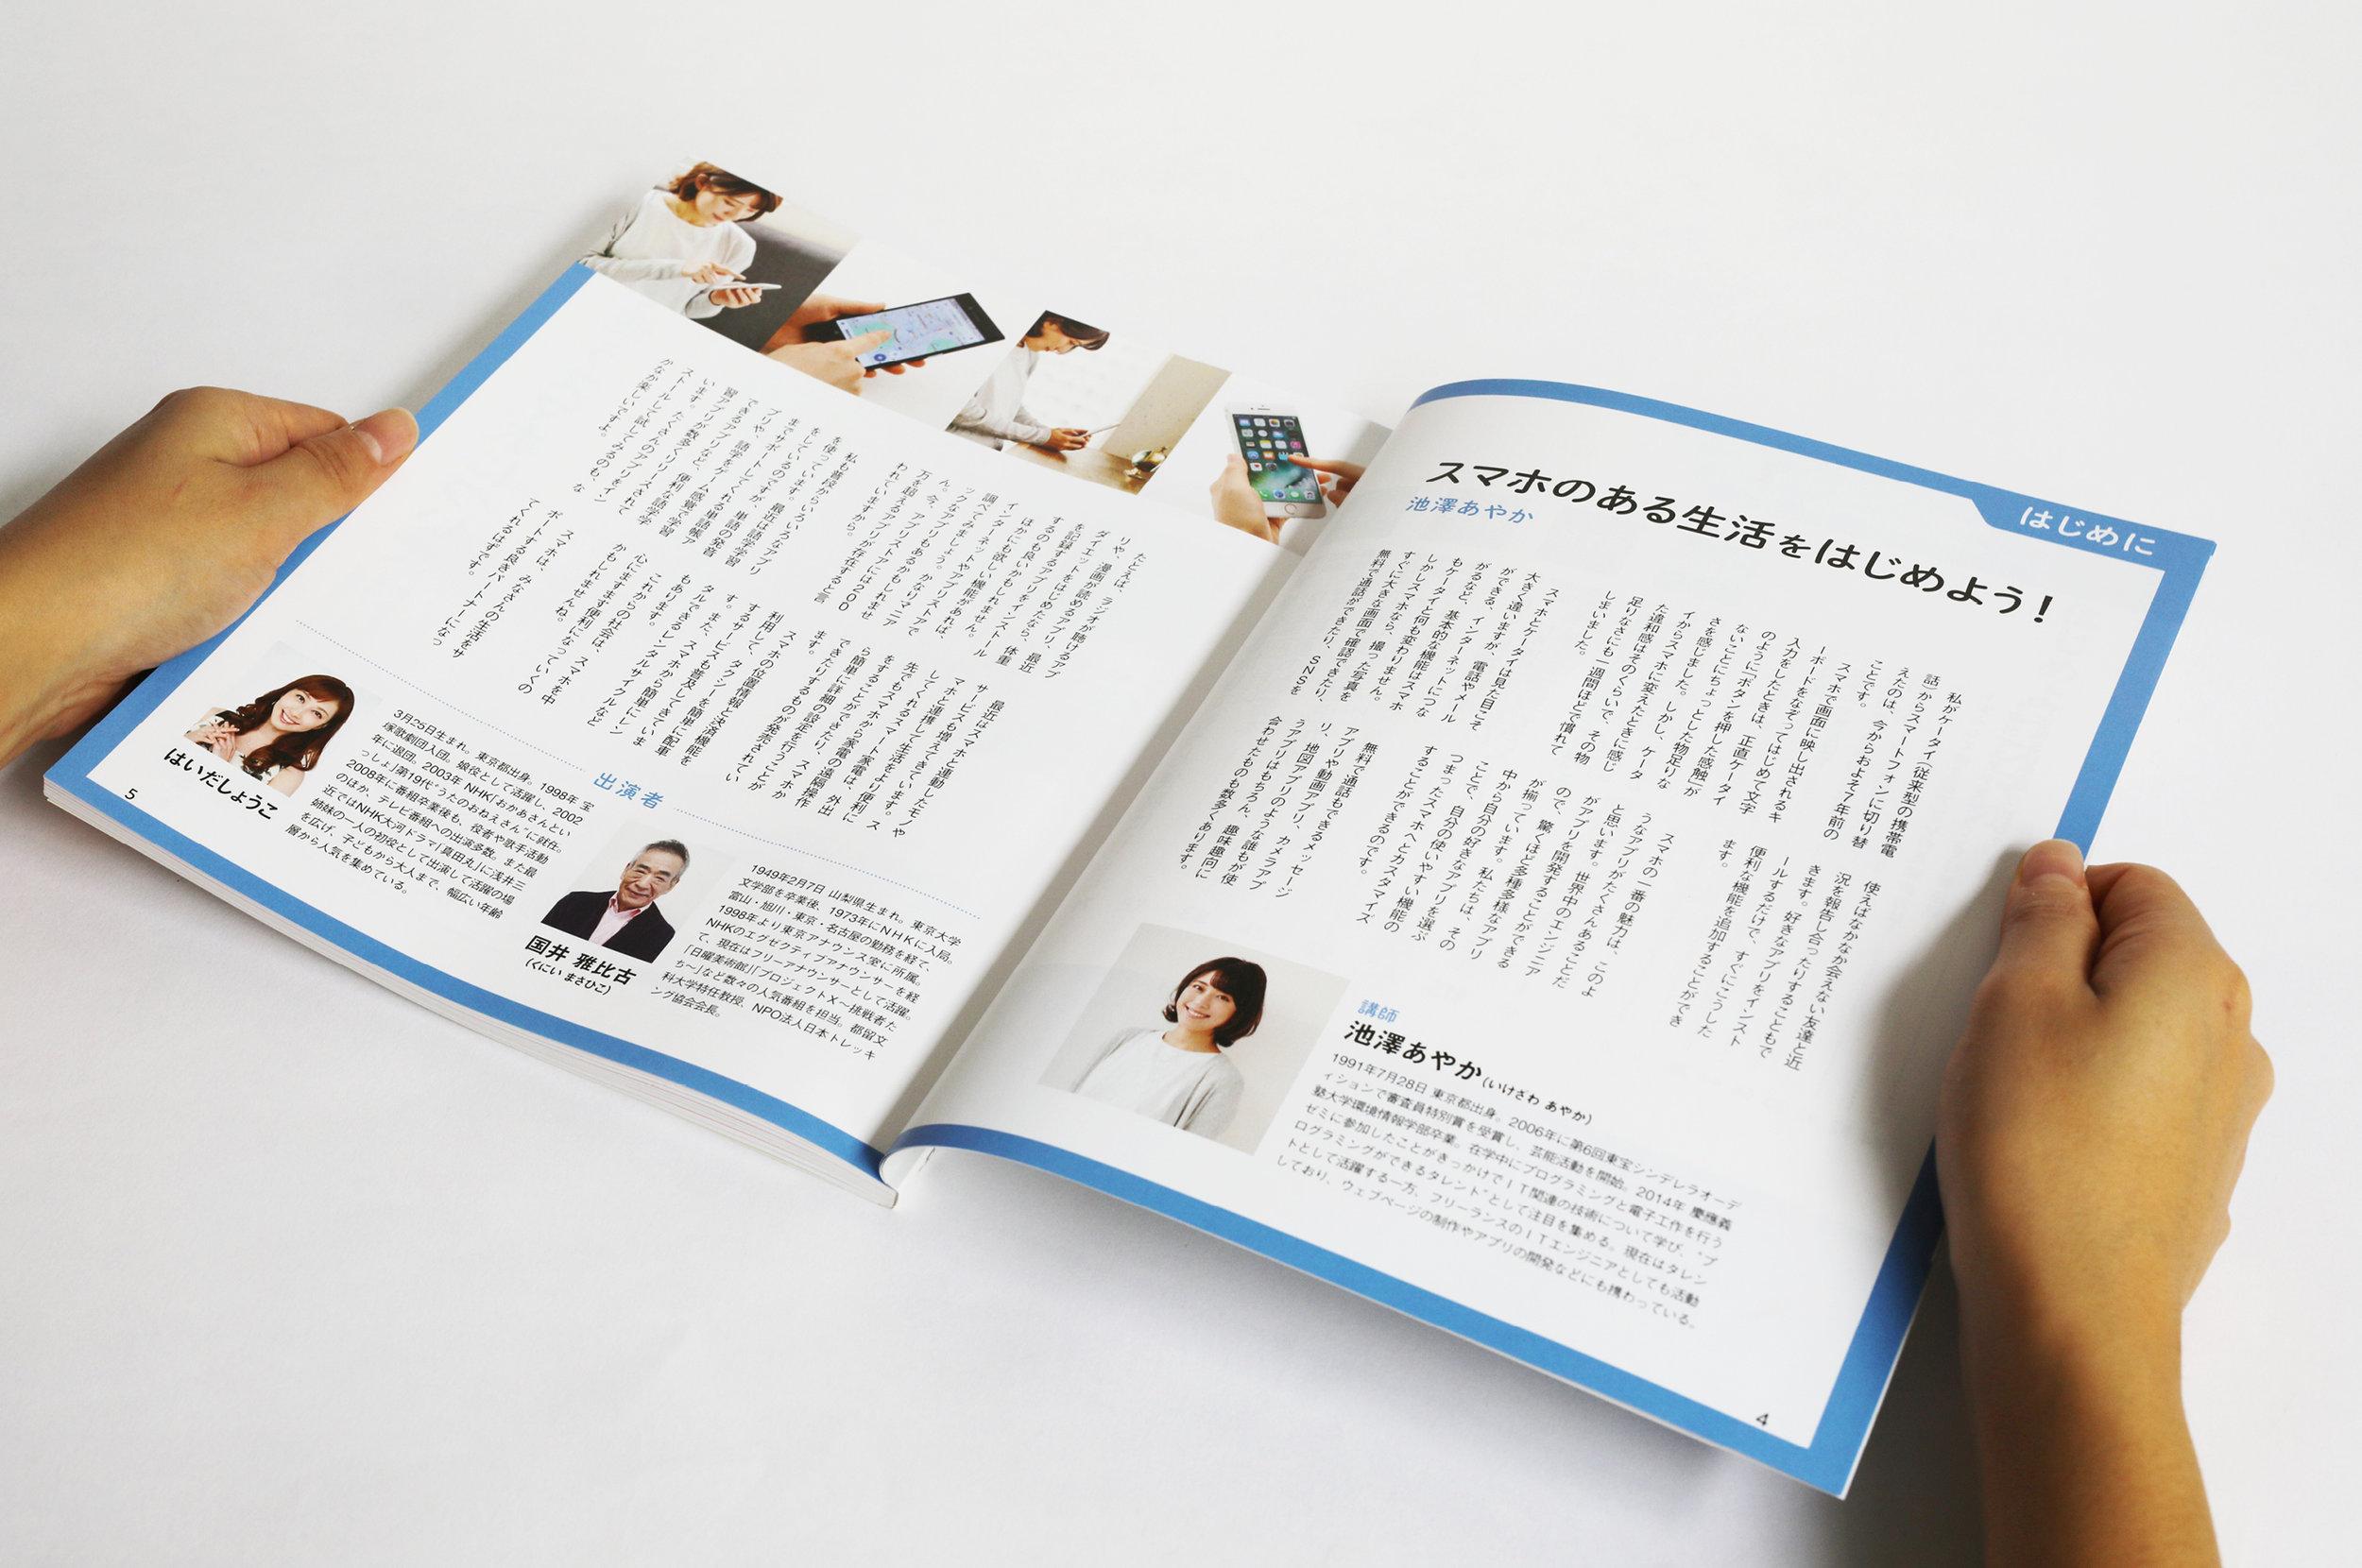 NHK_shumi_4.jpg